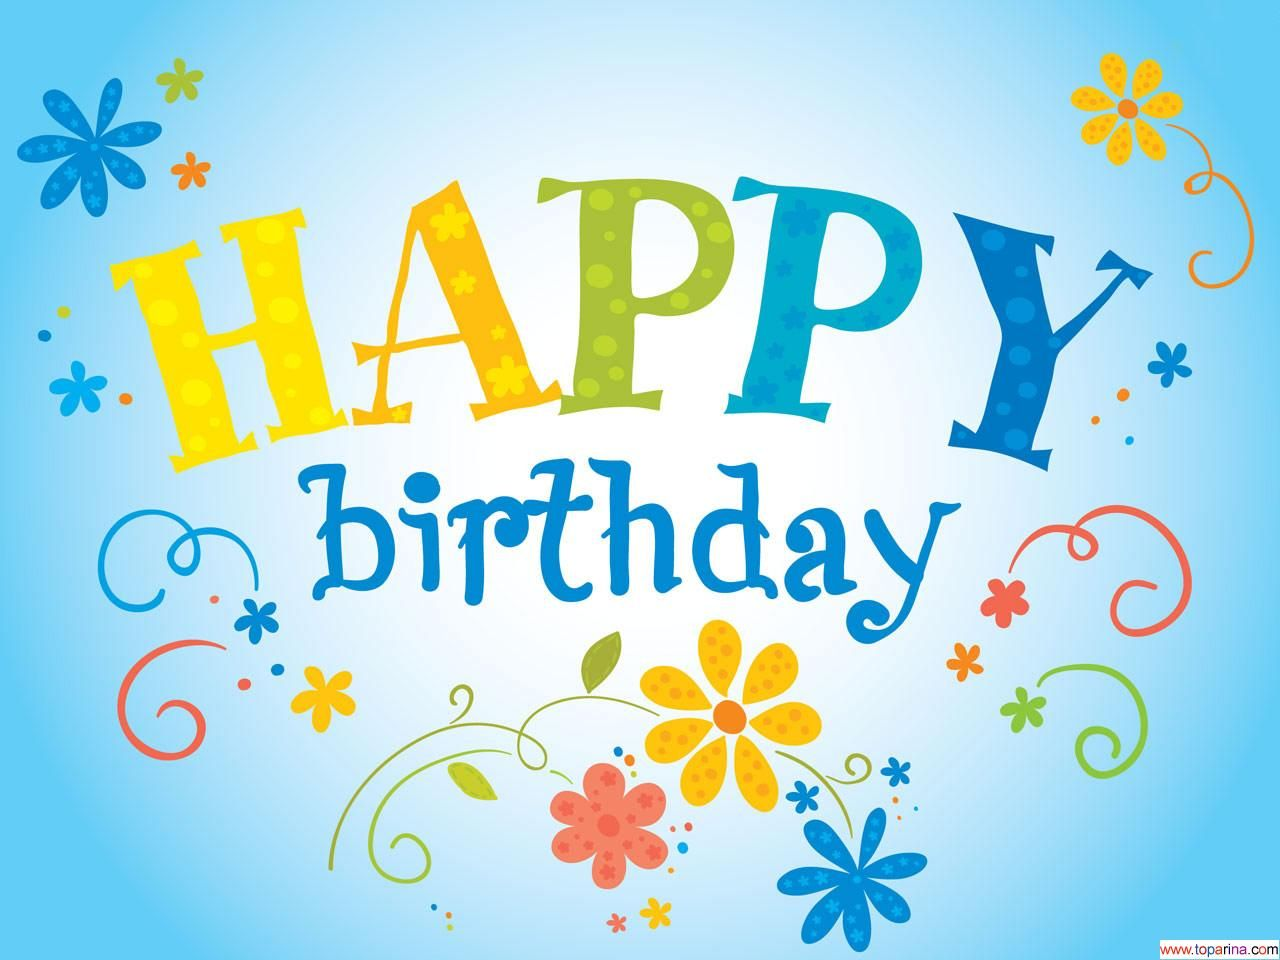 Free happy birthday hd background houzz mgmt aka good to know free happy birthday hd background kristyandbryce Choice Image